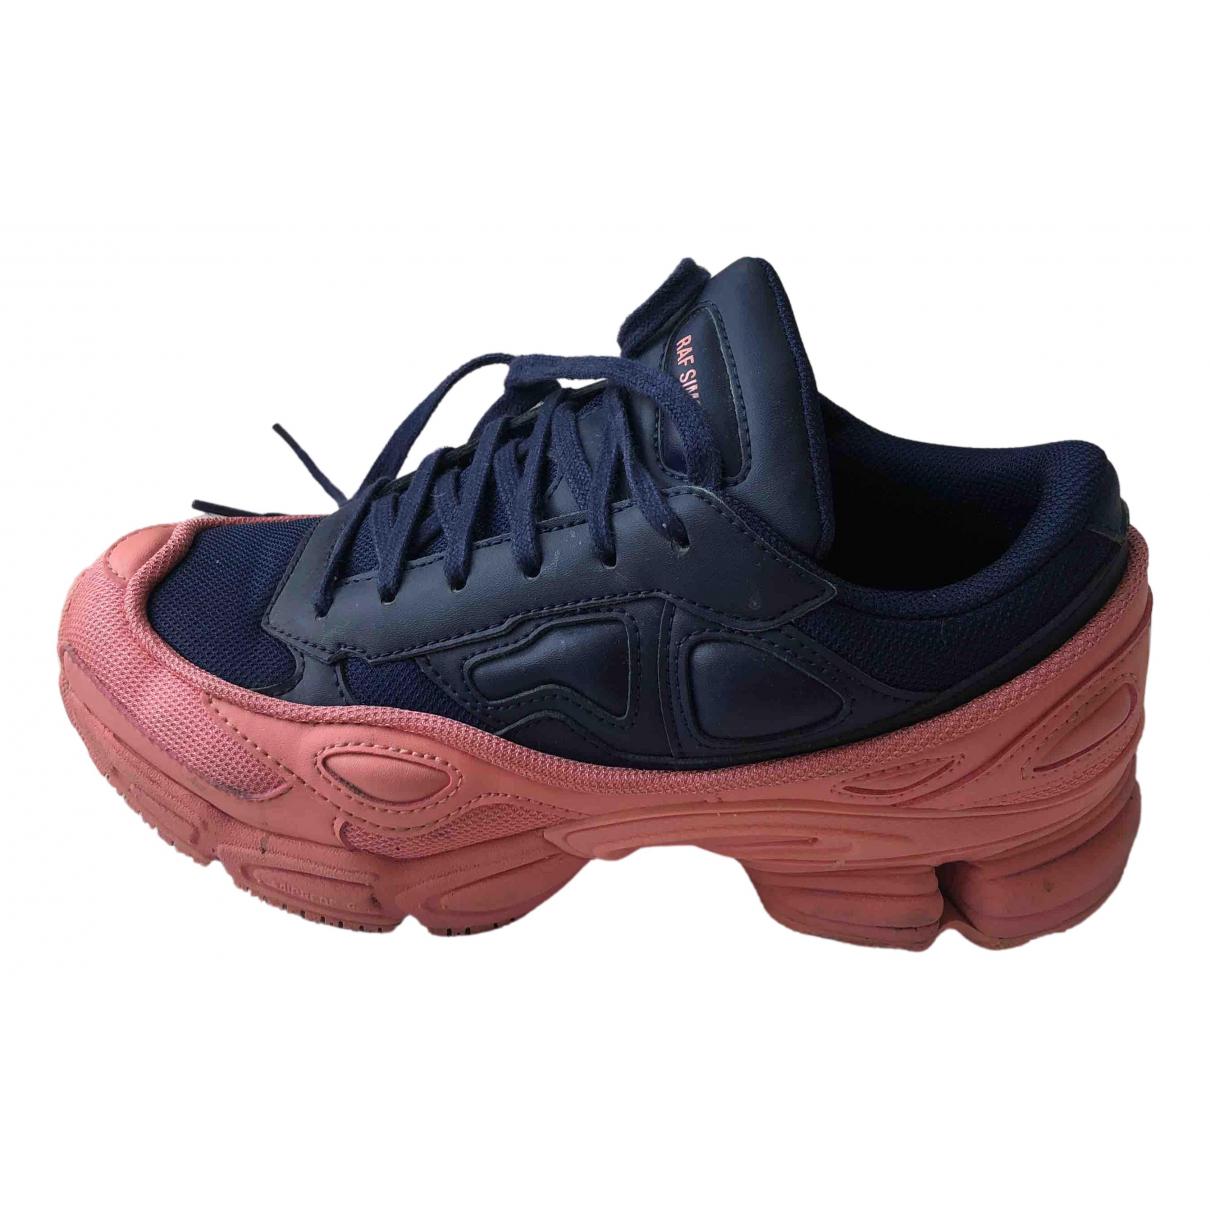 Adidas X Raf Simons Ozweego 2 Pink Trainers for Women 37 EU